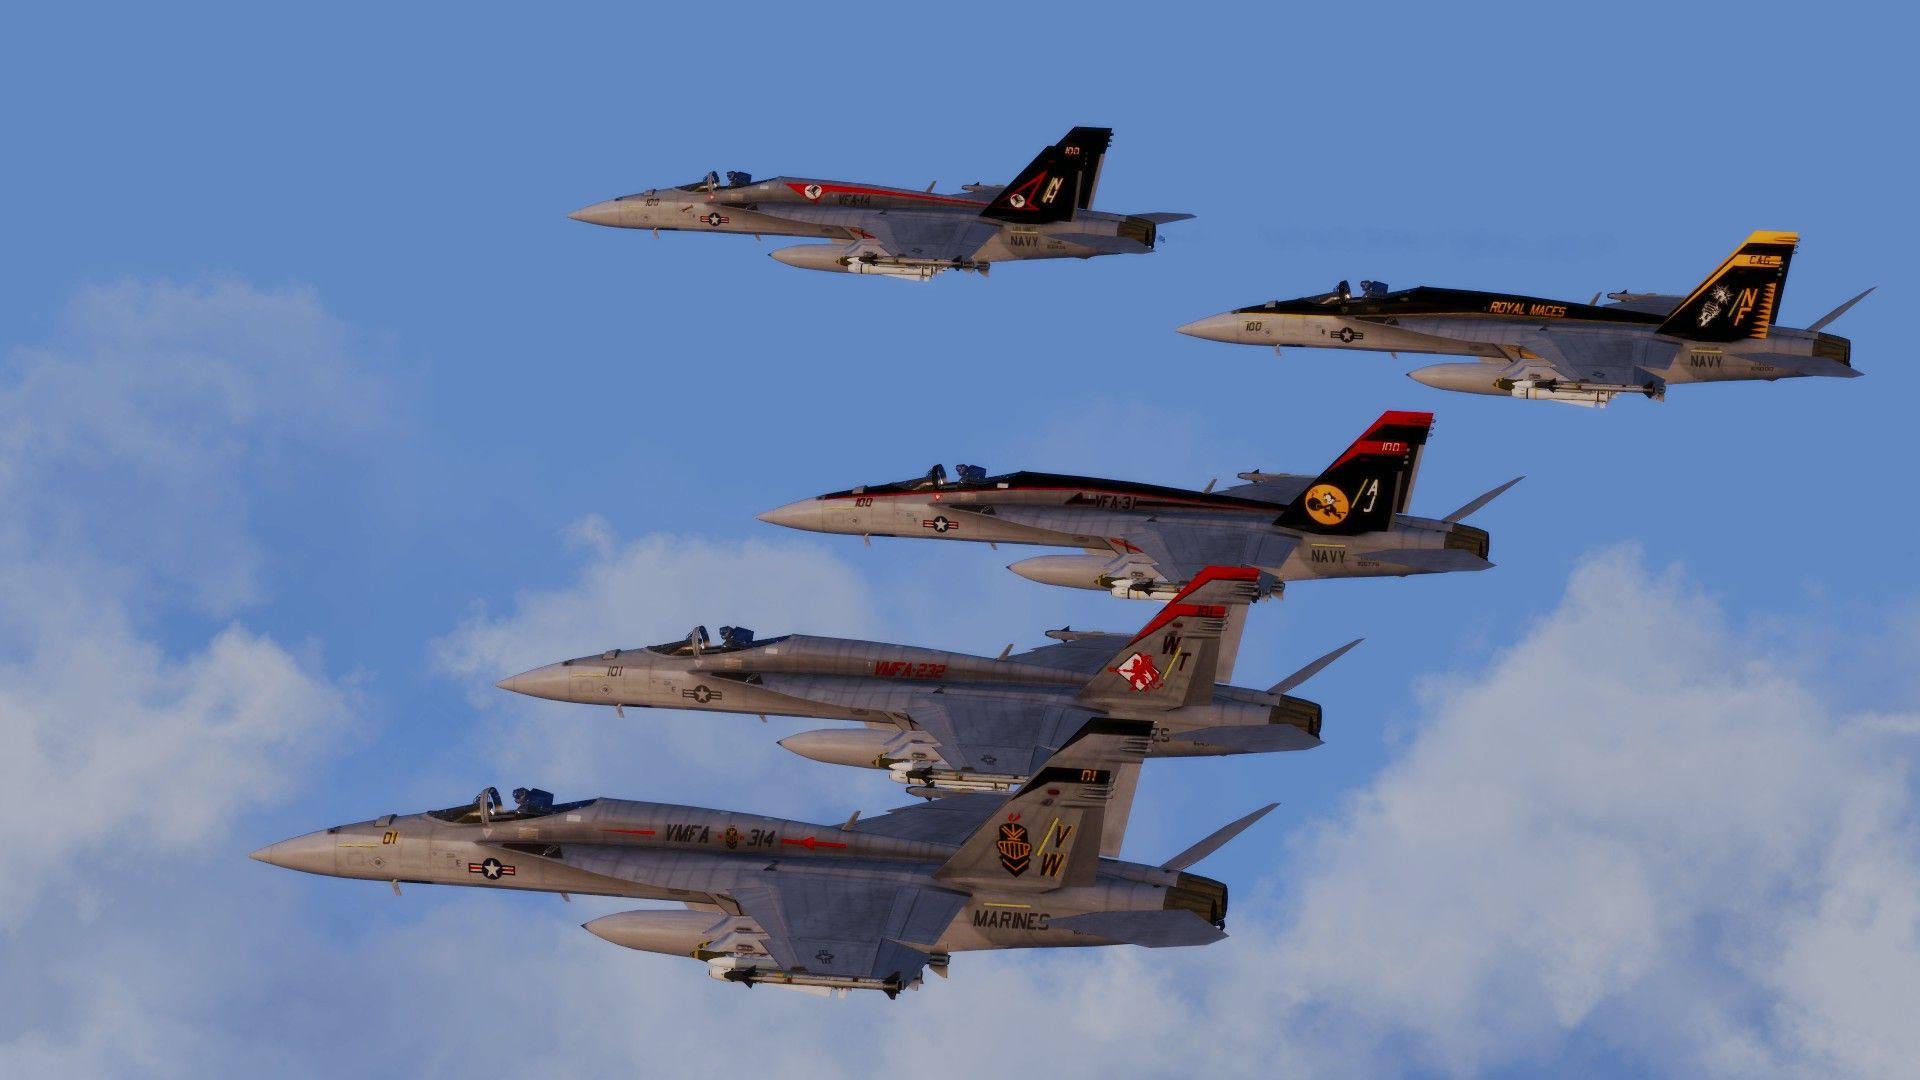 FA-18 Super Hornet pack (Arma 3) | Gaming 3D Graphics